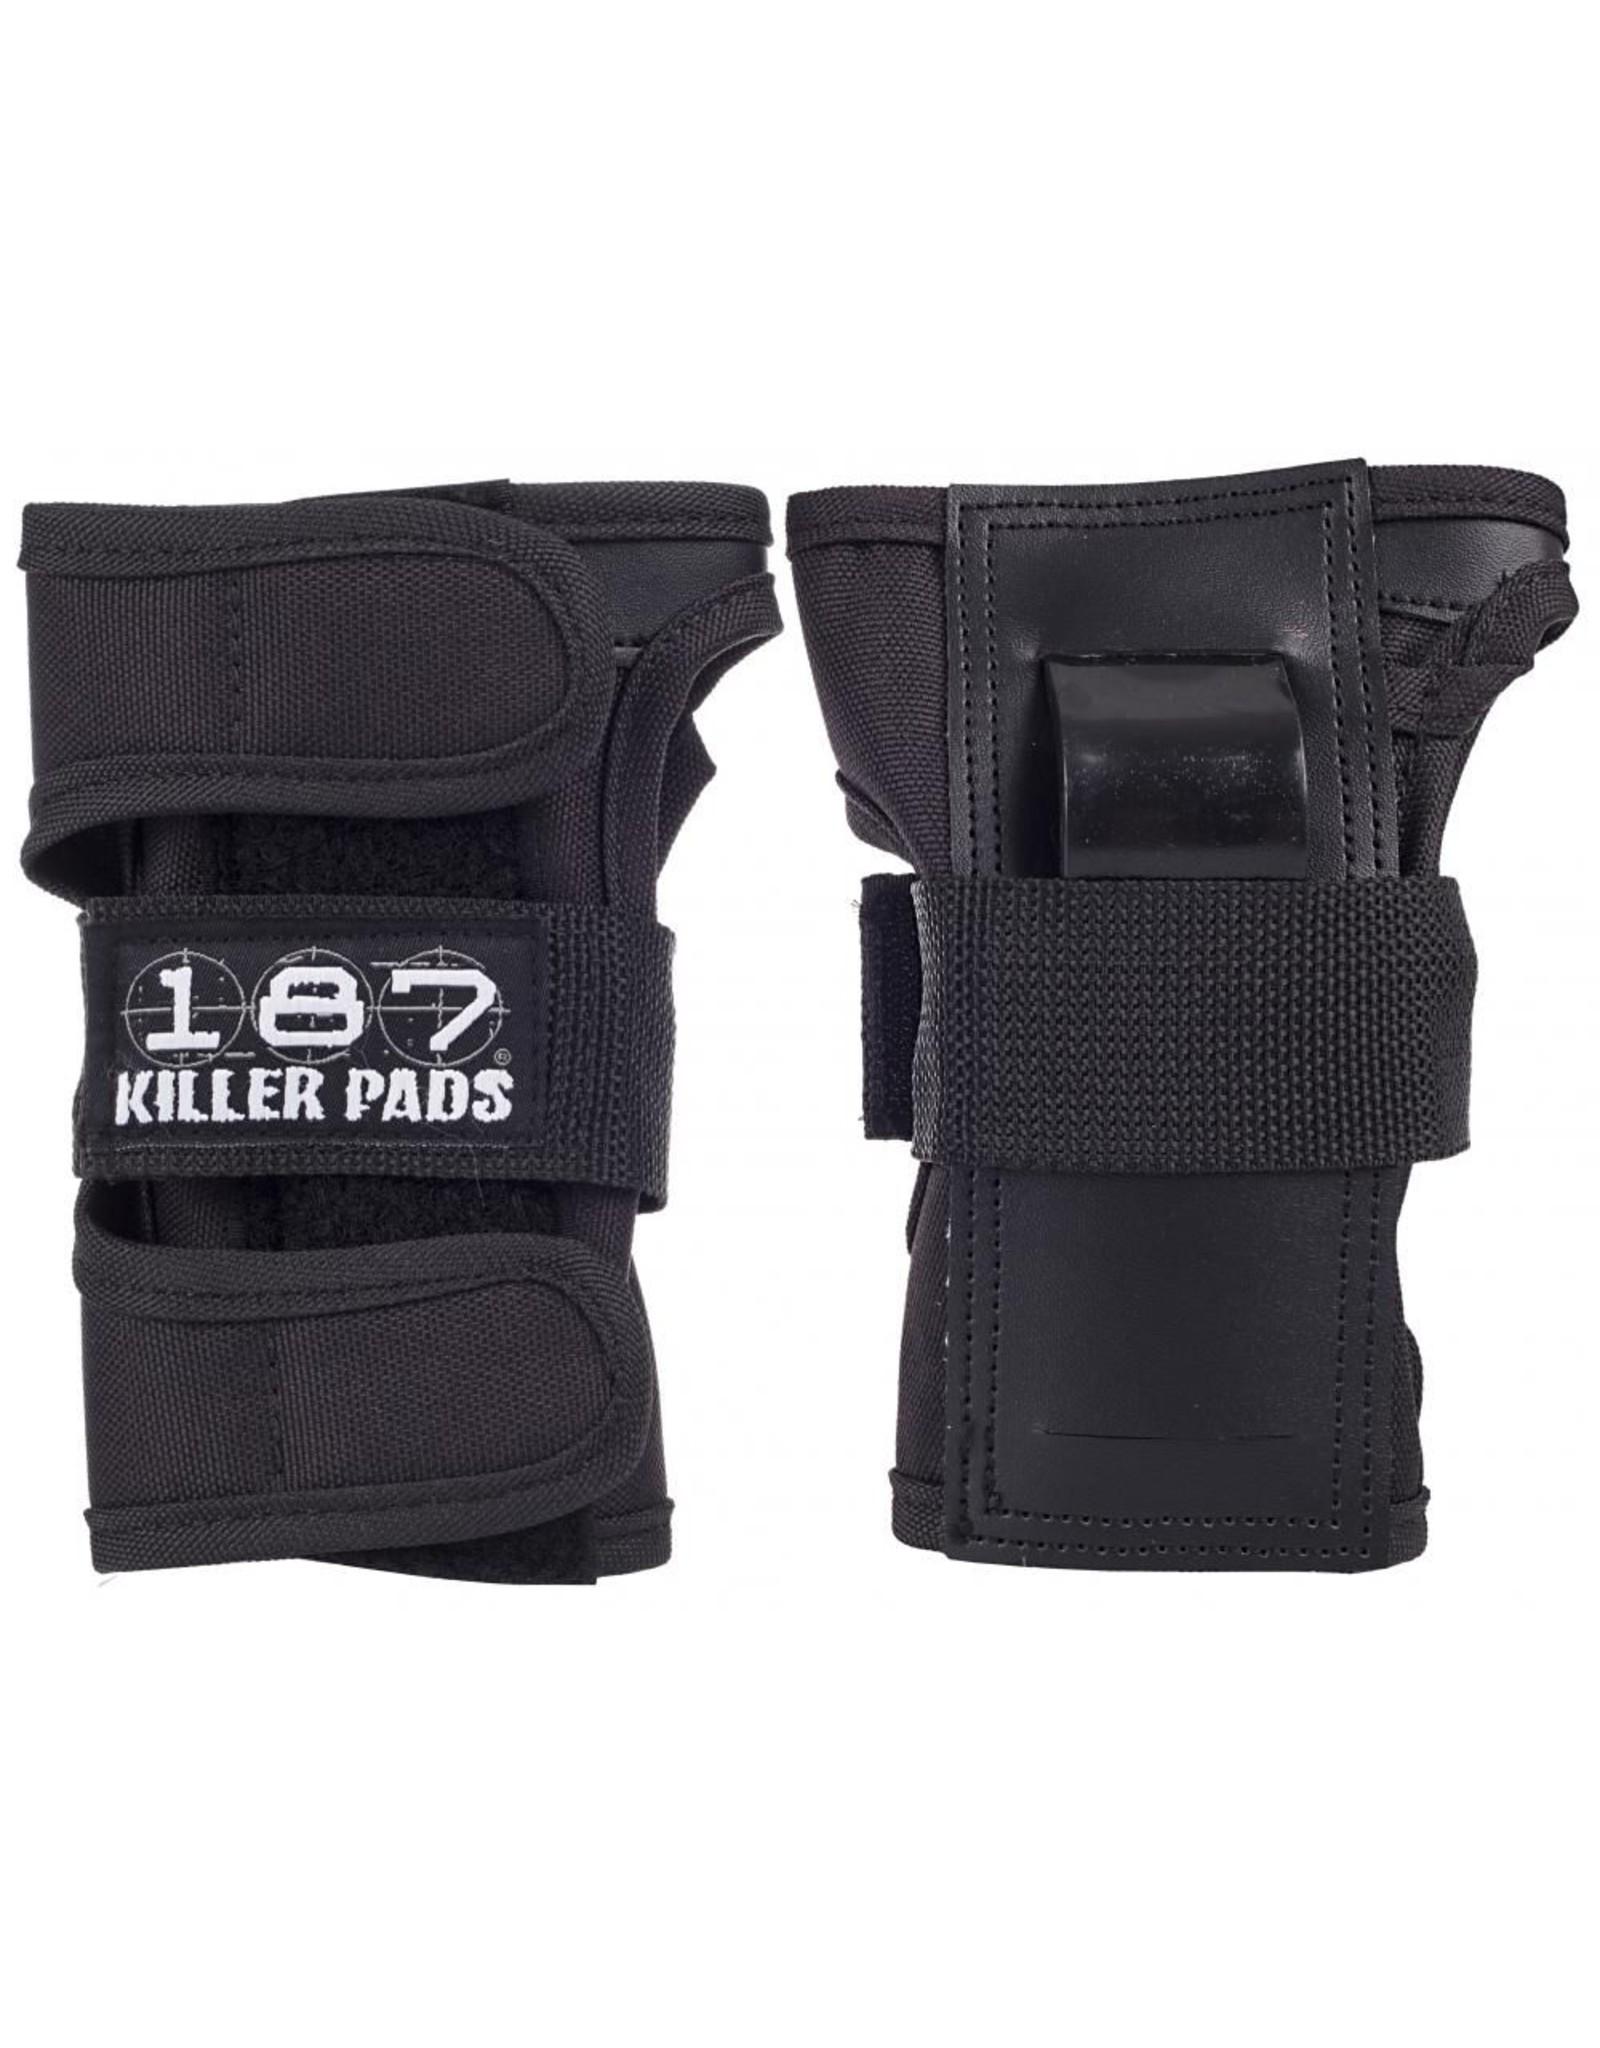 187 187 - Killer Pads Wrist Guard - Black - S